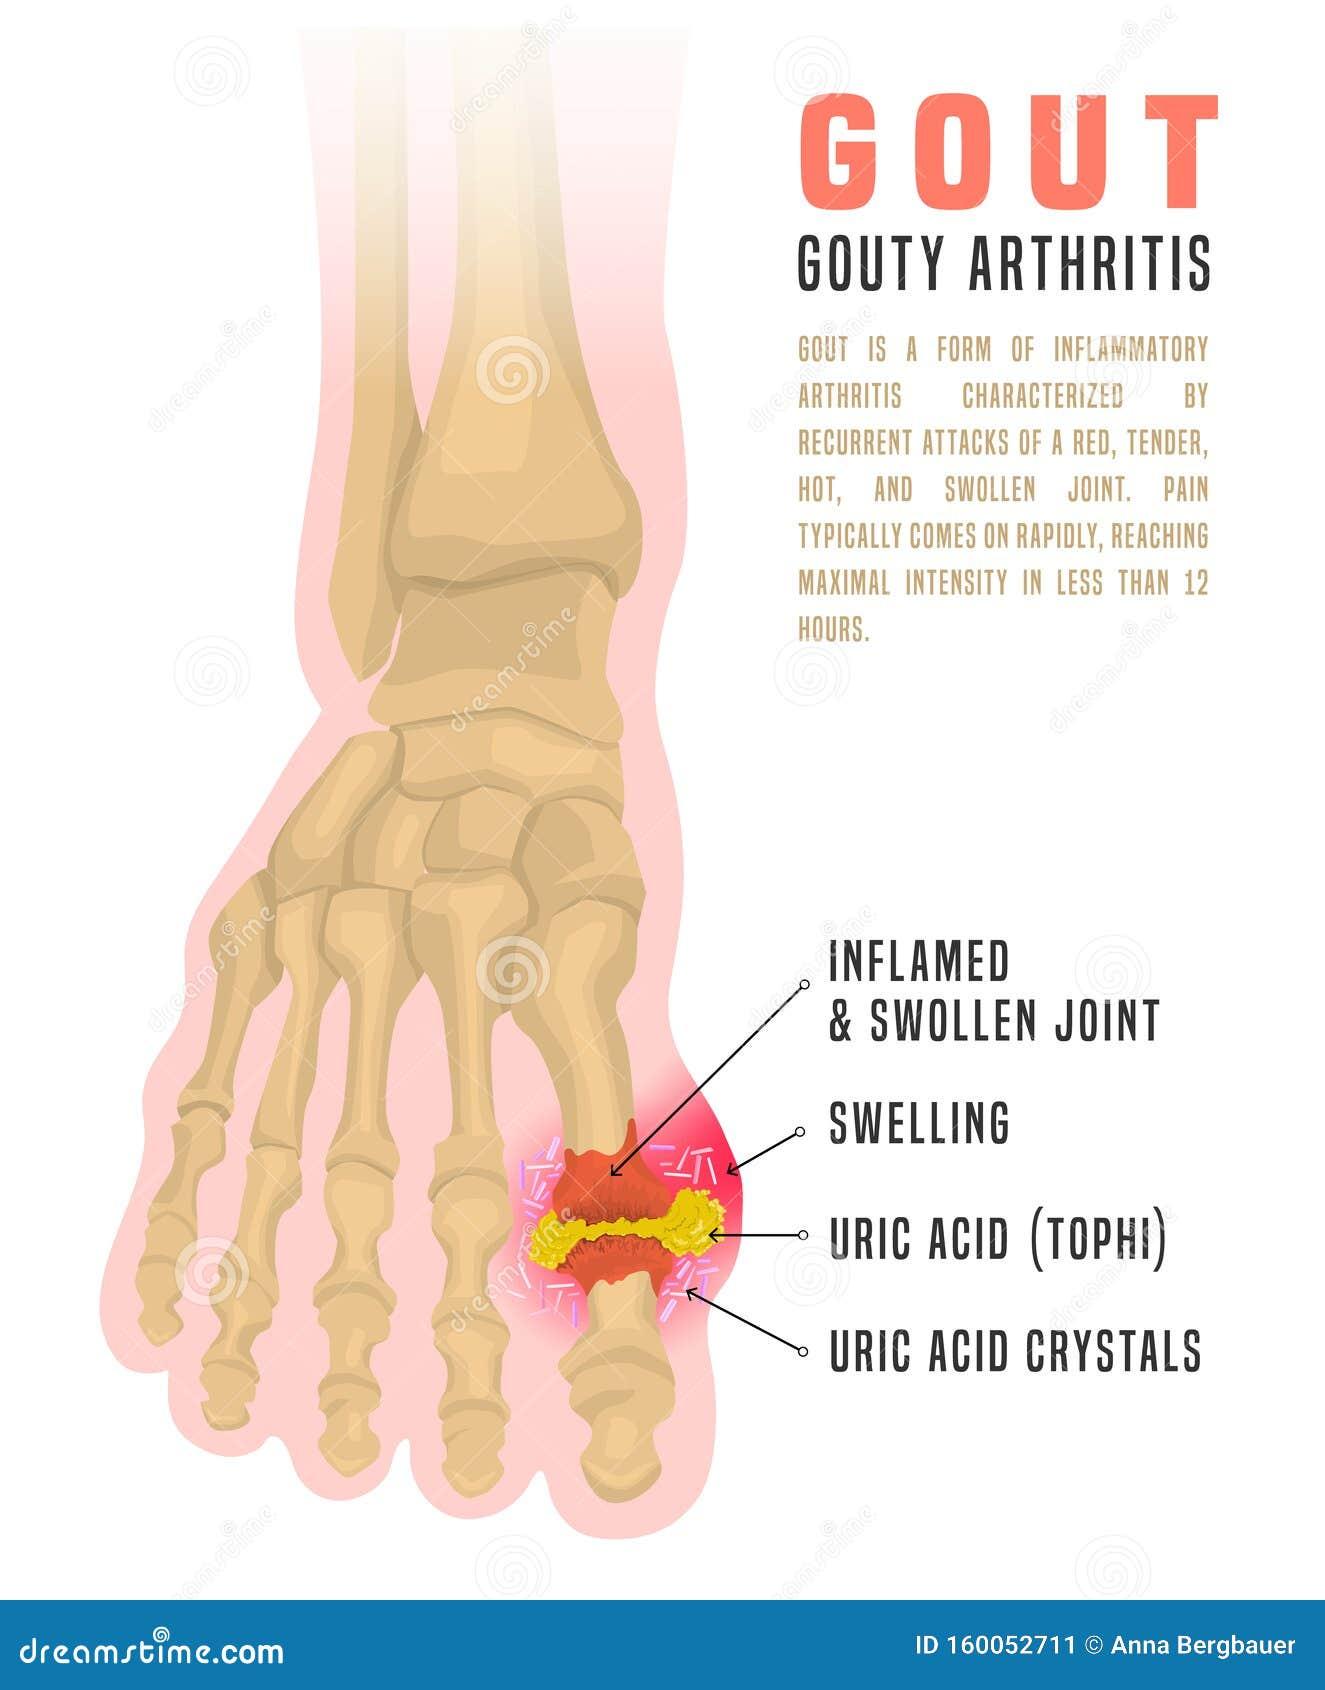 Gout Arthritis Infographic Stock Vector Illustration Of Anatomy 160052711